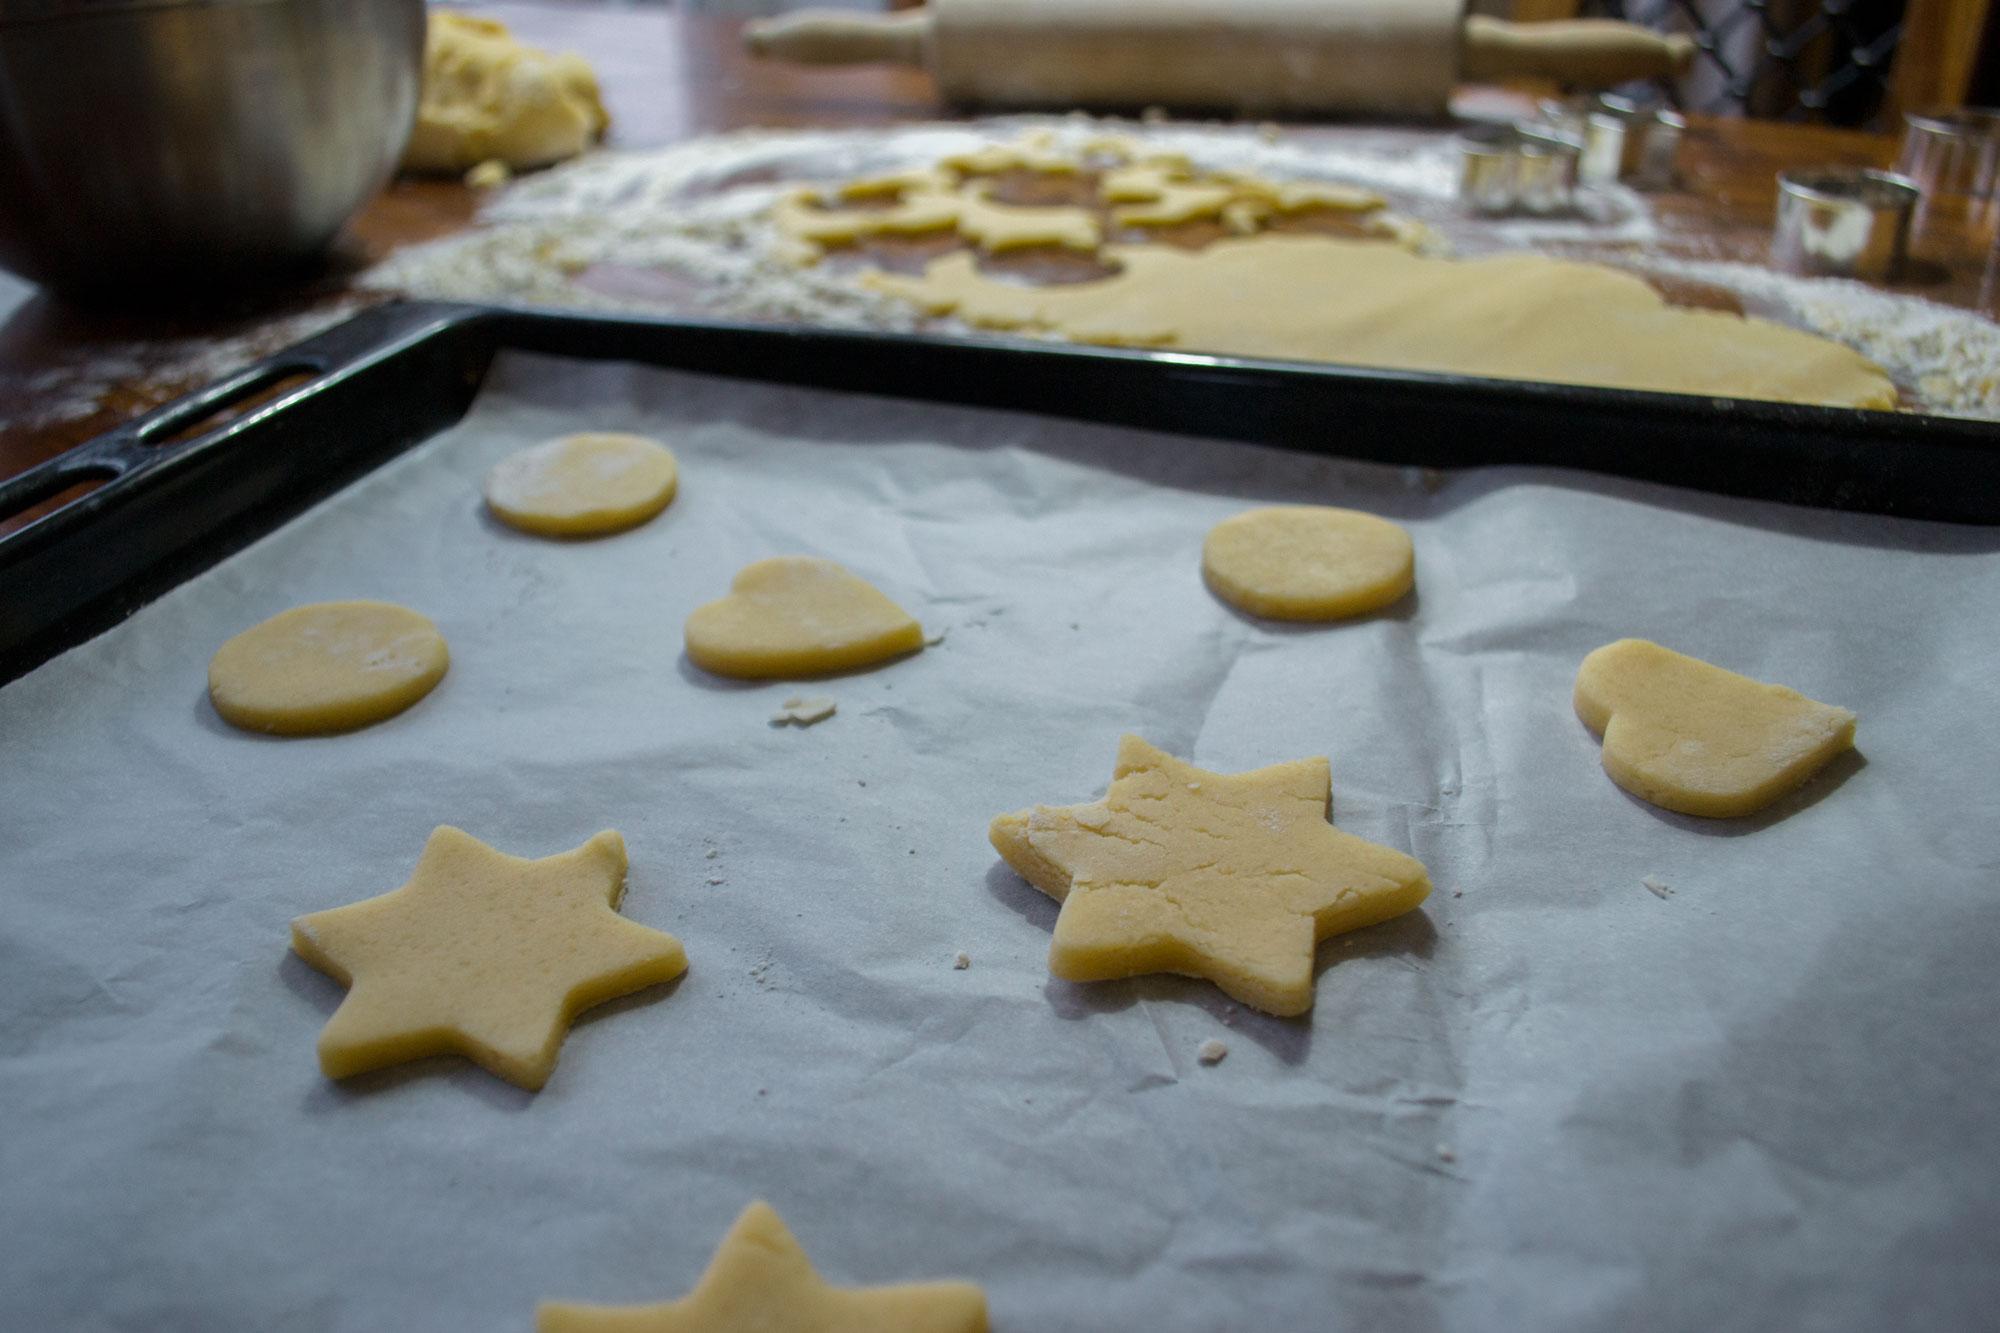 Domaći kolač s orasima - jednostavan recept - oblikovanje